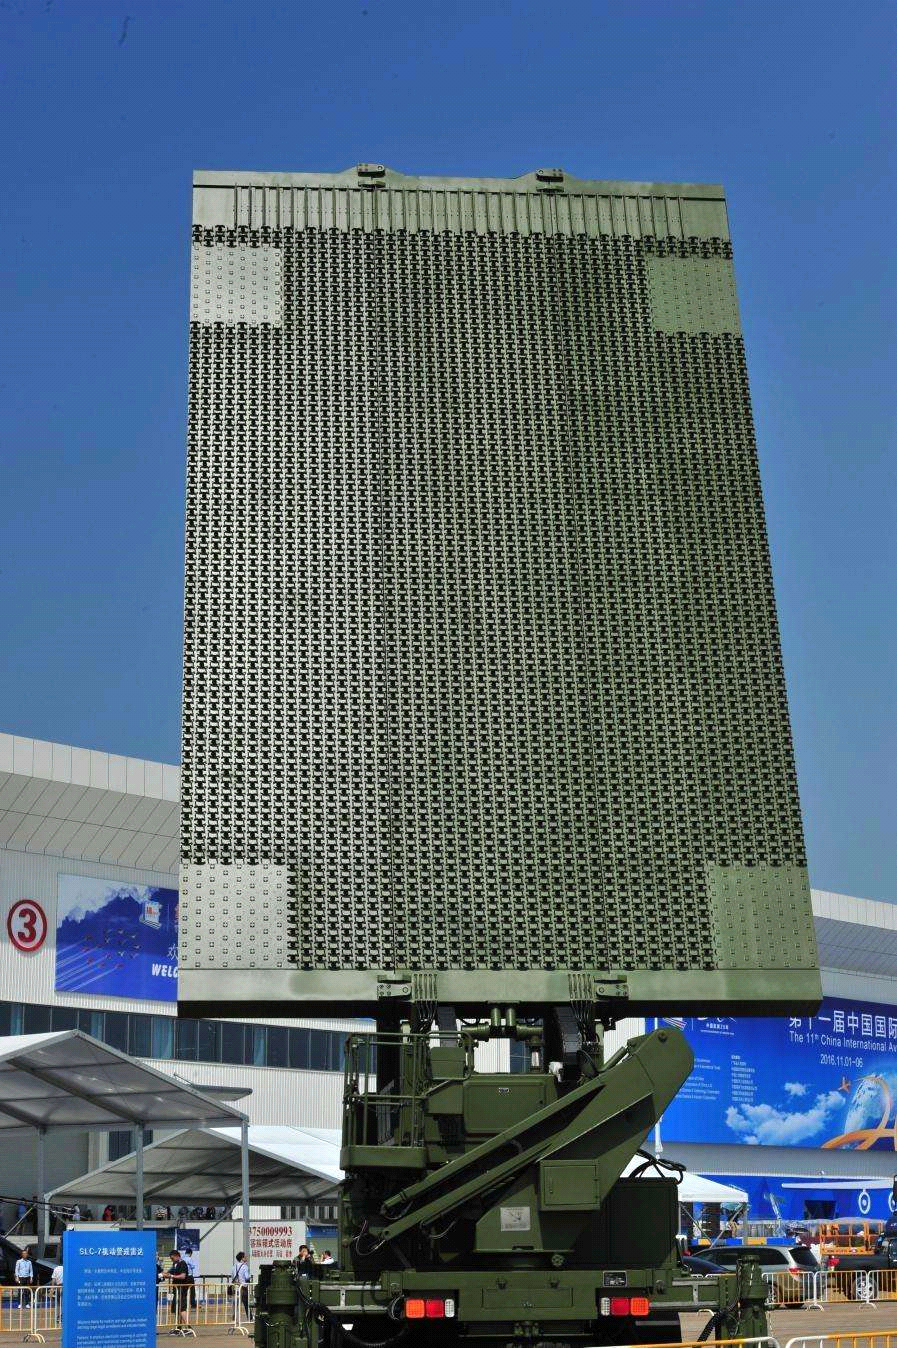 SLC-7是第四代情报雷达的代表型号。